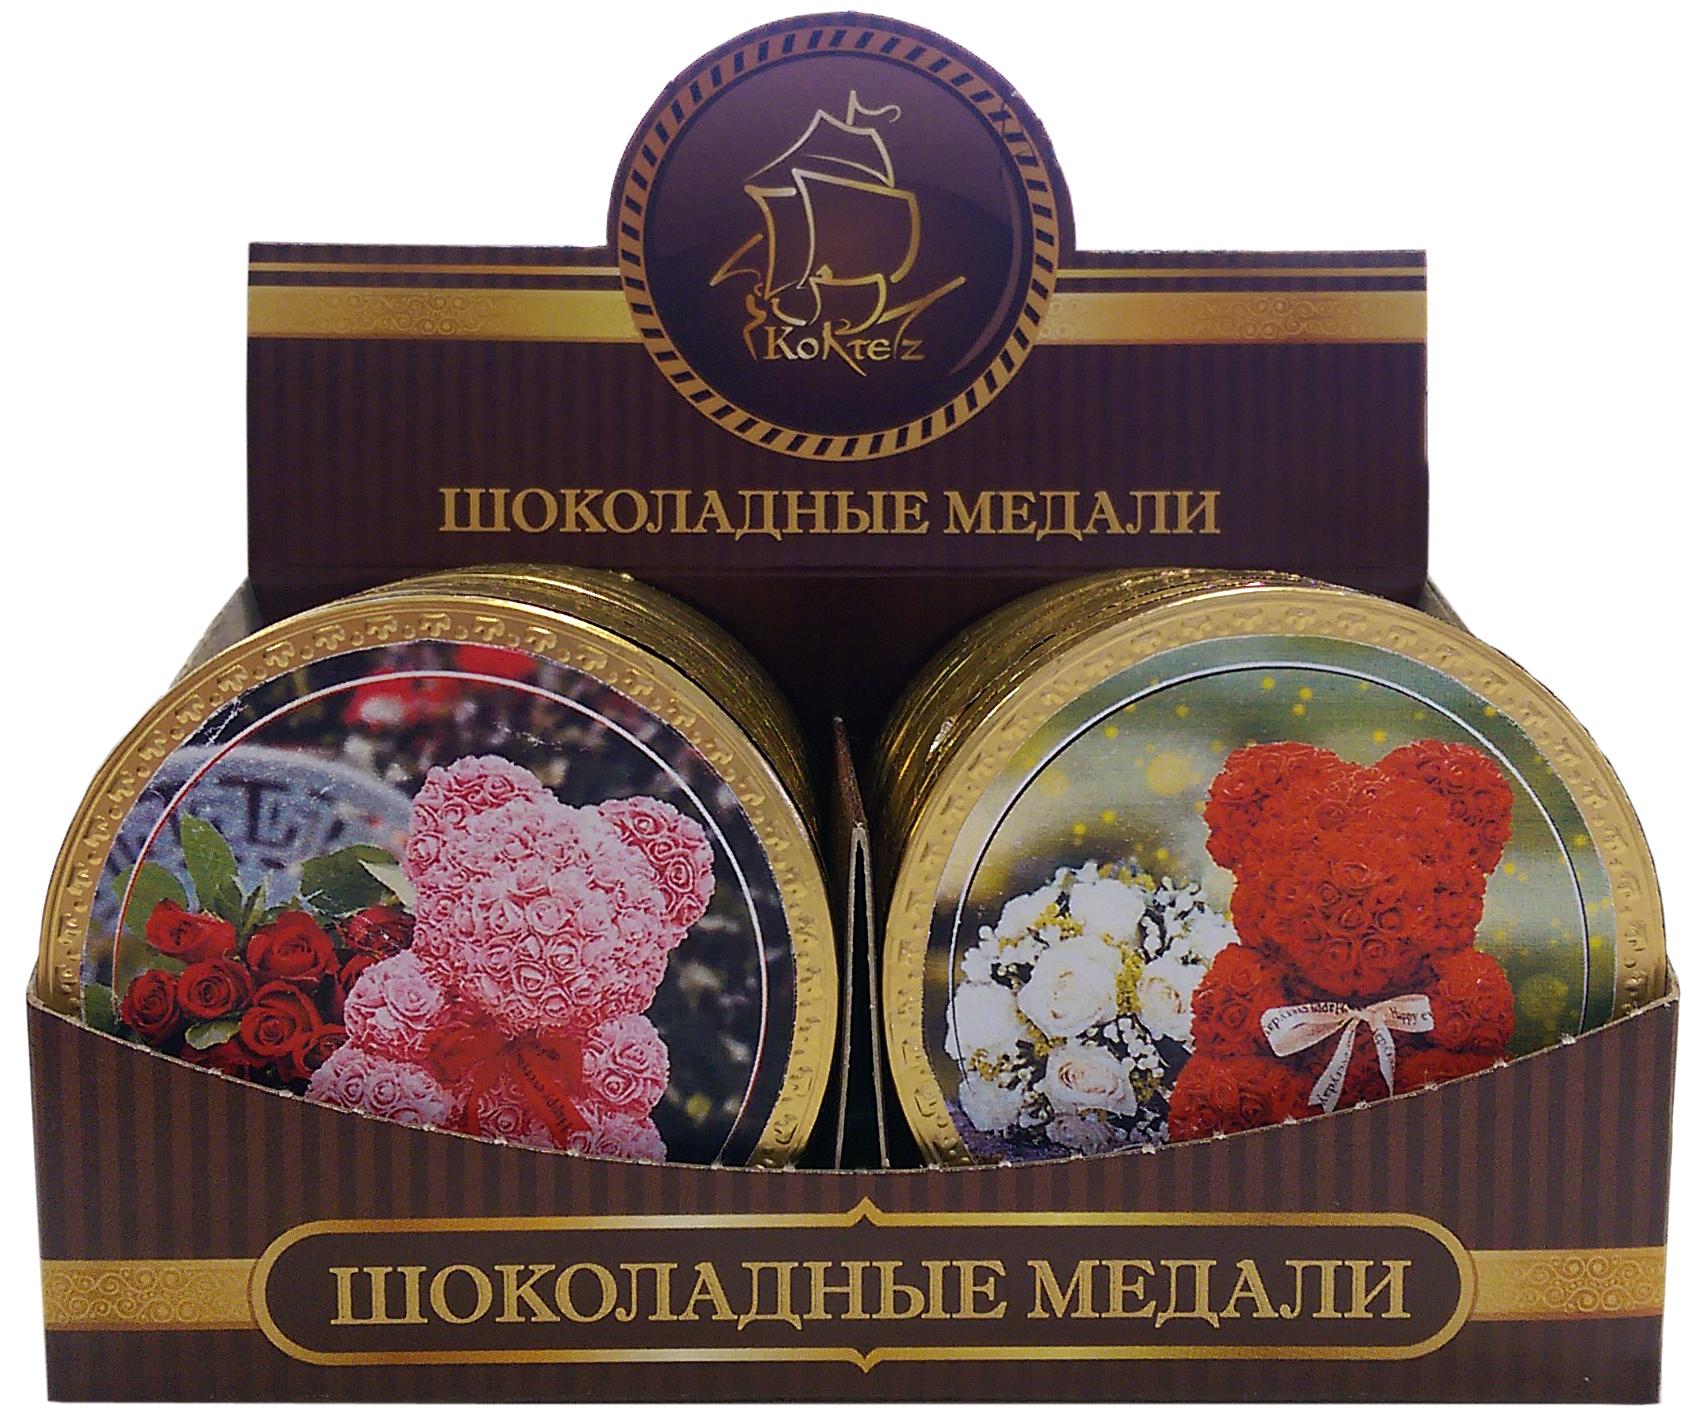 "25г шоколад фигурный молочный Медаль ""МИШКА ИЗ РОЗ"""